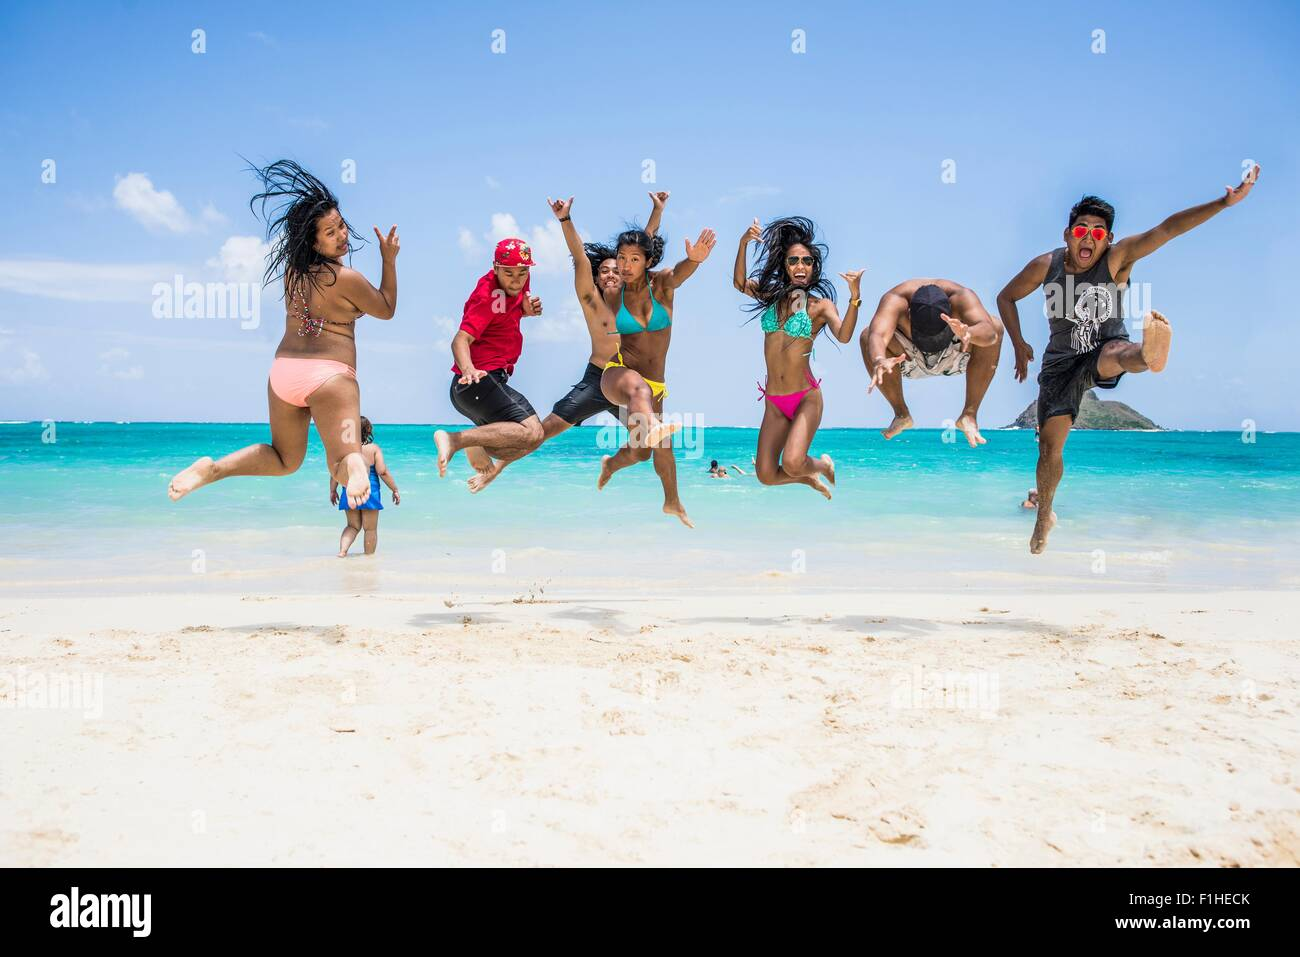 Seven young adults jumping mid air on Lanikai Beach, Oahu, Hawaii, USA - Stock Image